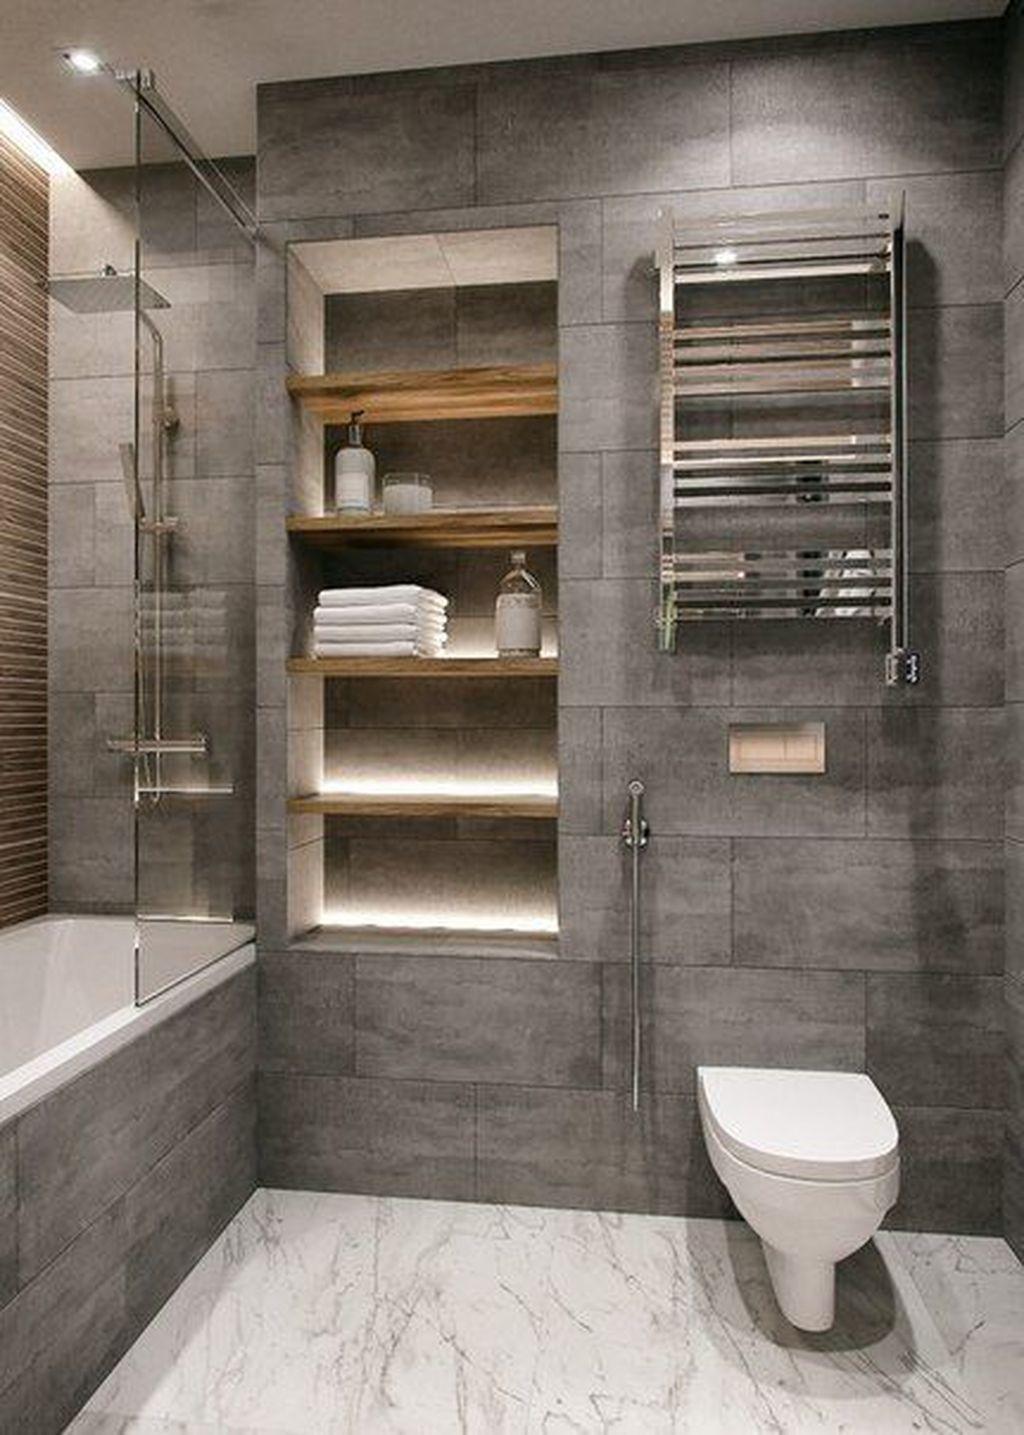 Latest Bathroom Interior 3d Design Ideas For Your Home Bathroom Design Bathroom Interior Latest Bathroom